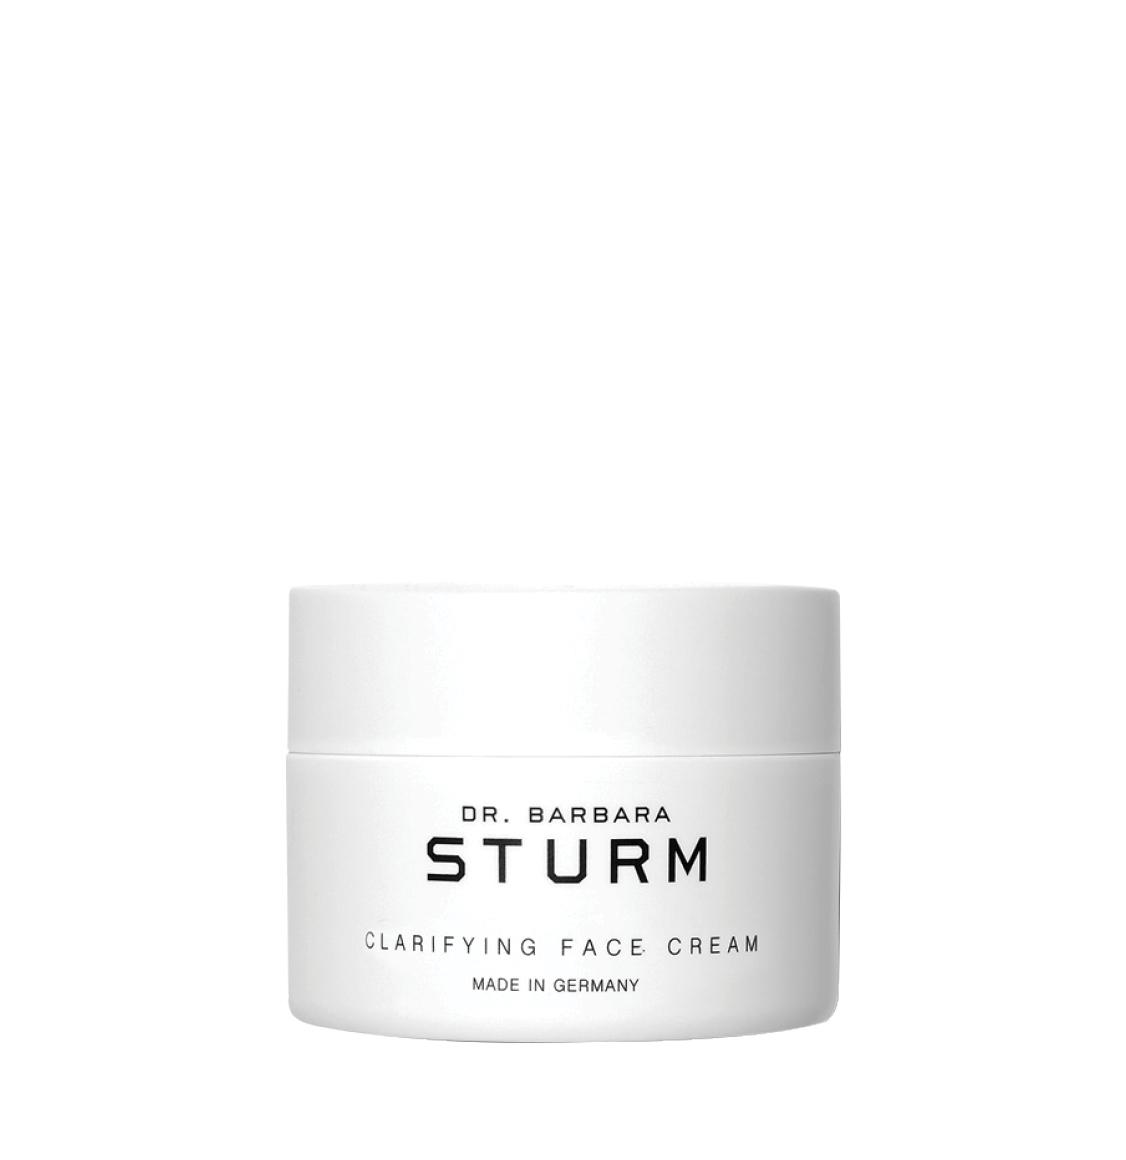 Dr. Barbara Sturm Clarifying Face Cream 50ml